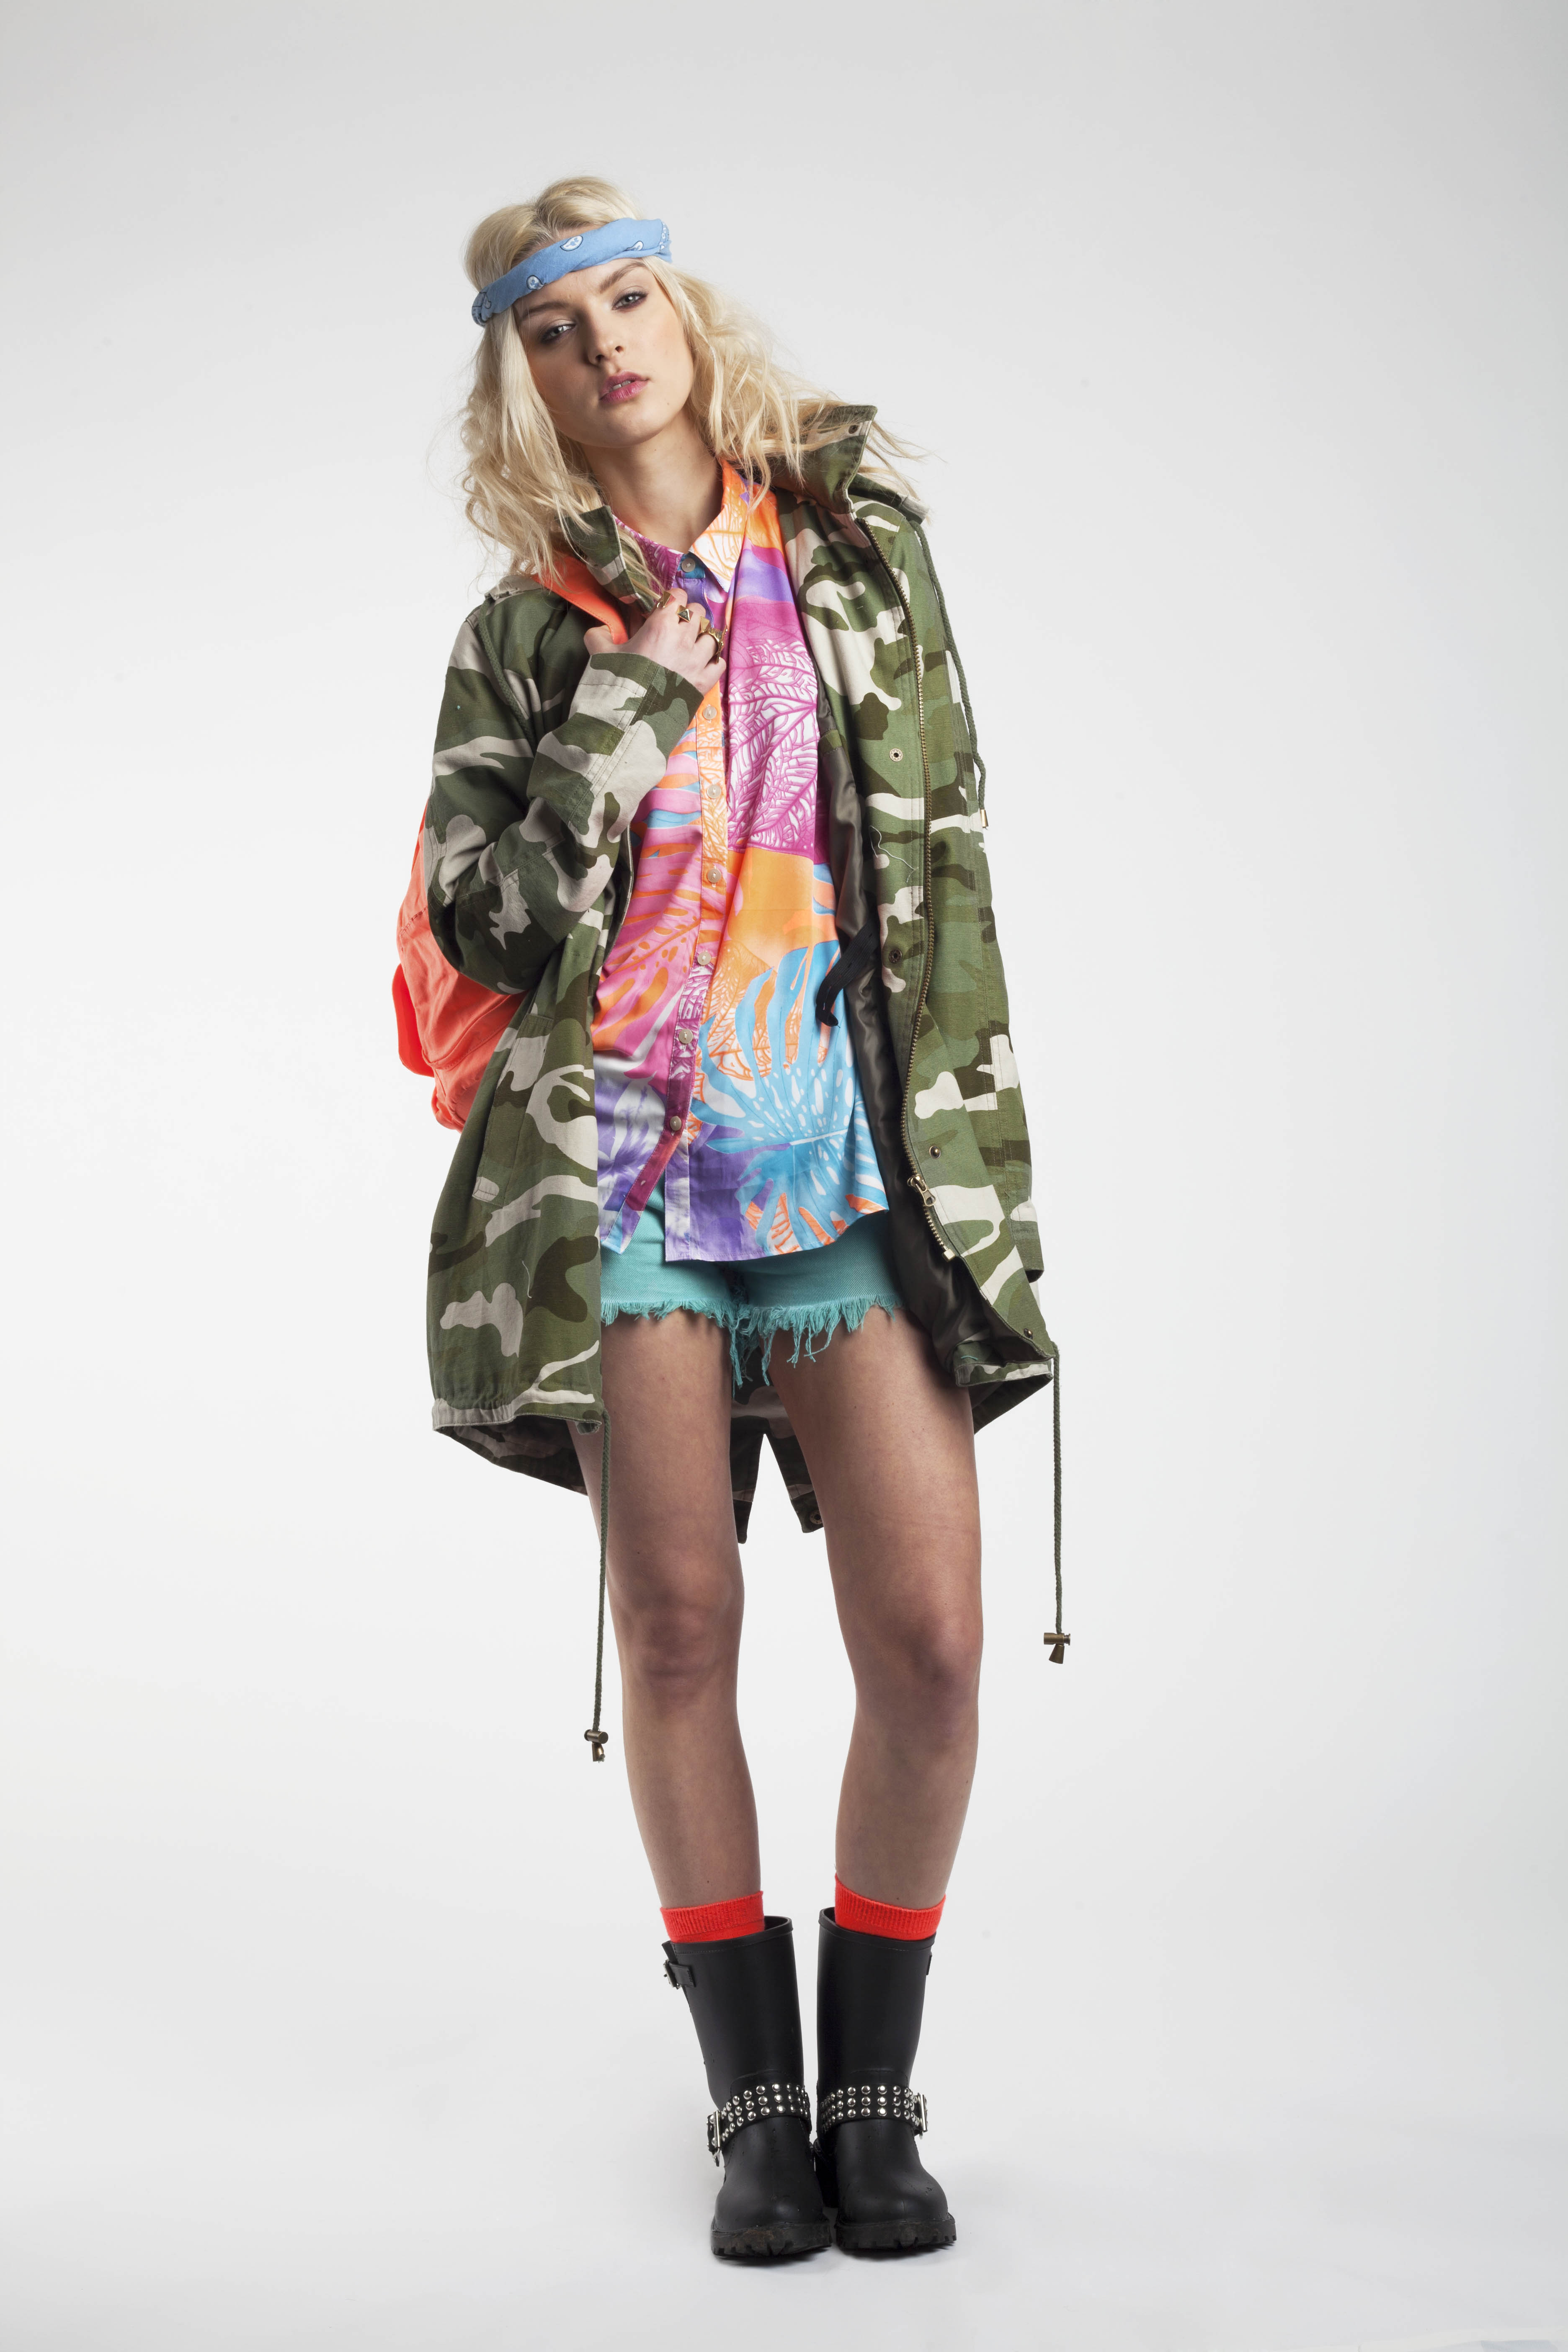 ab7003ffad Festival fashion: Something to BooHoo about - The Boar